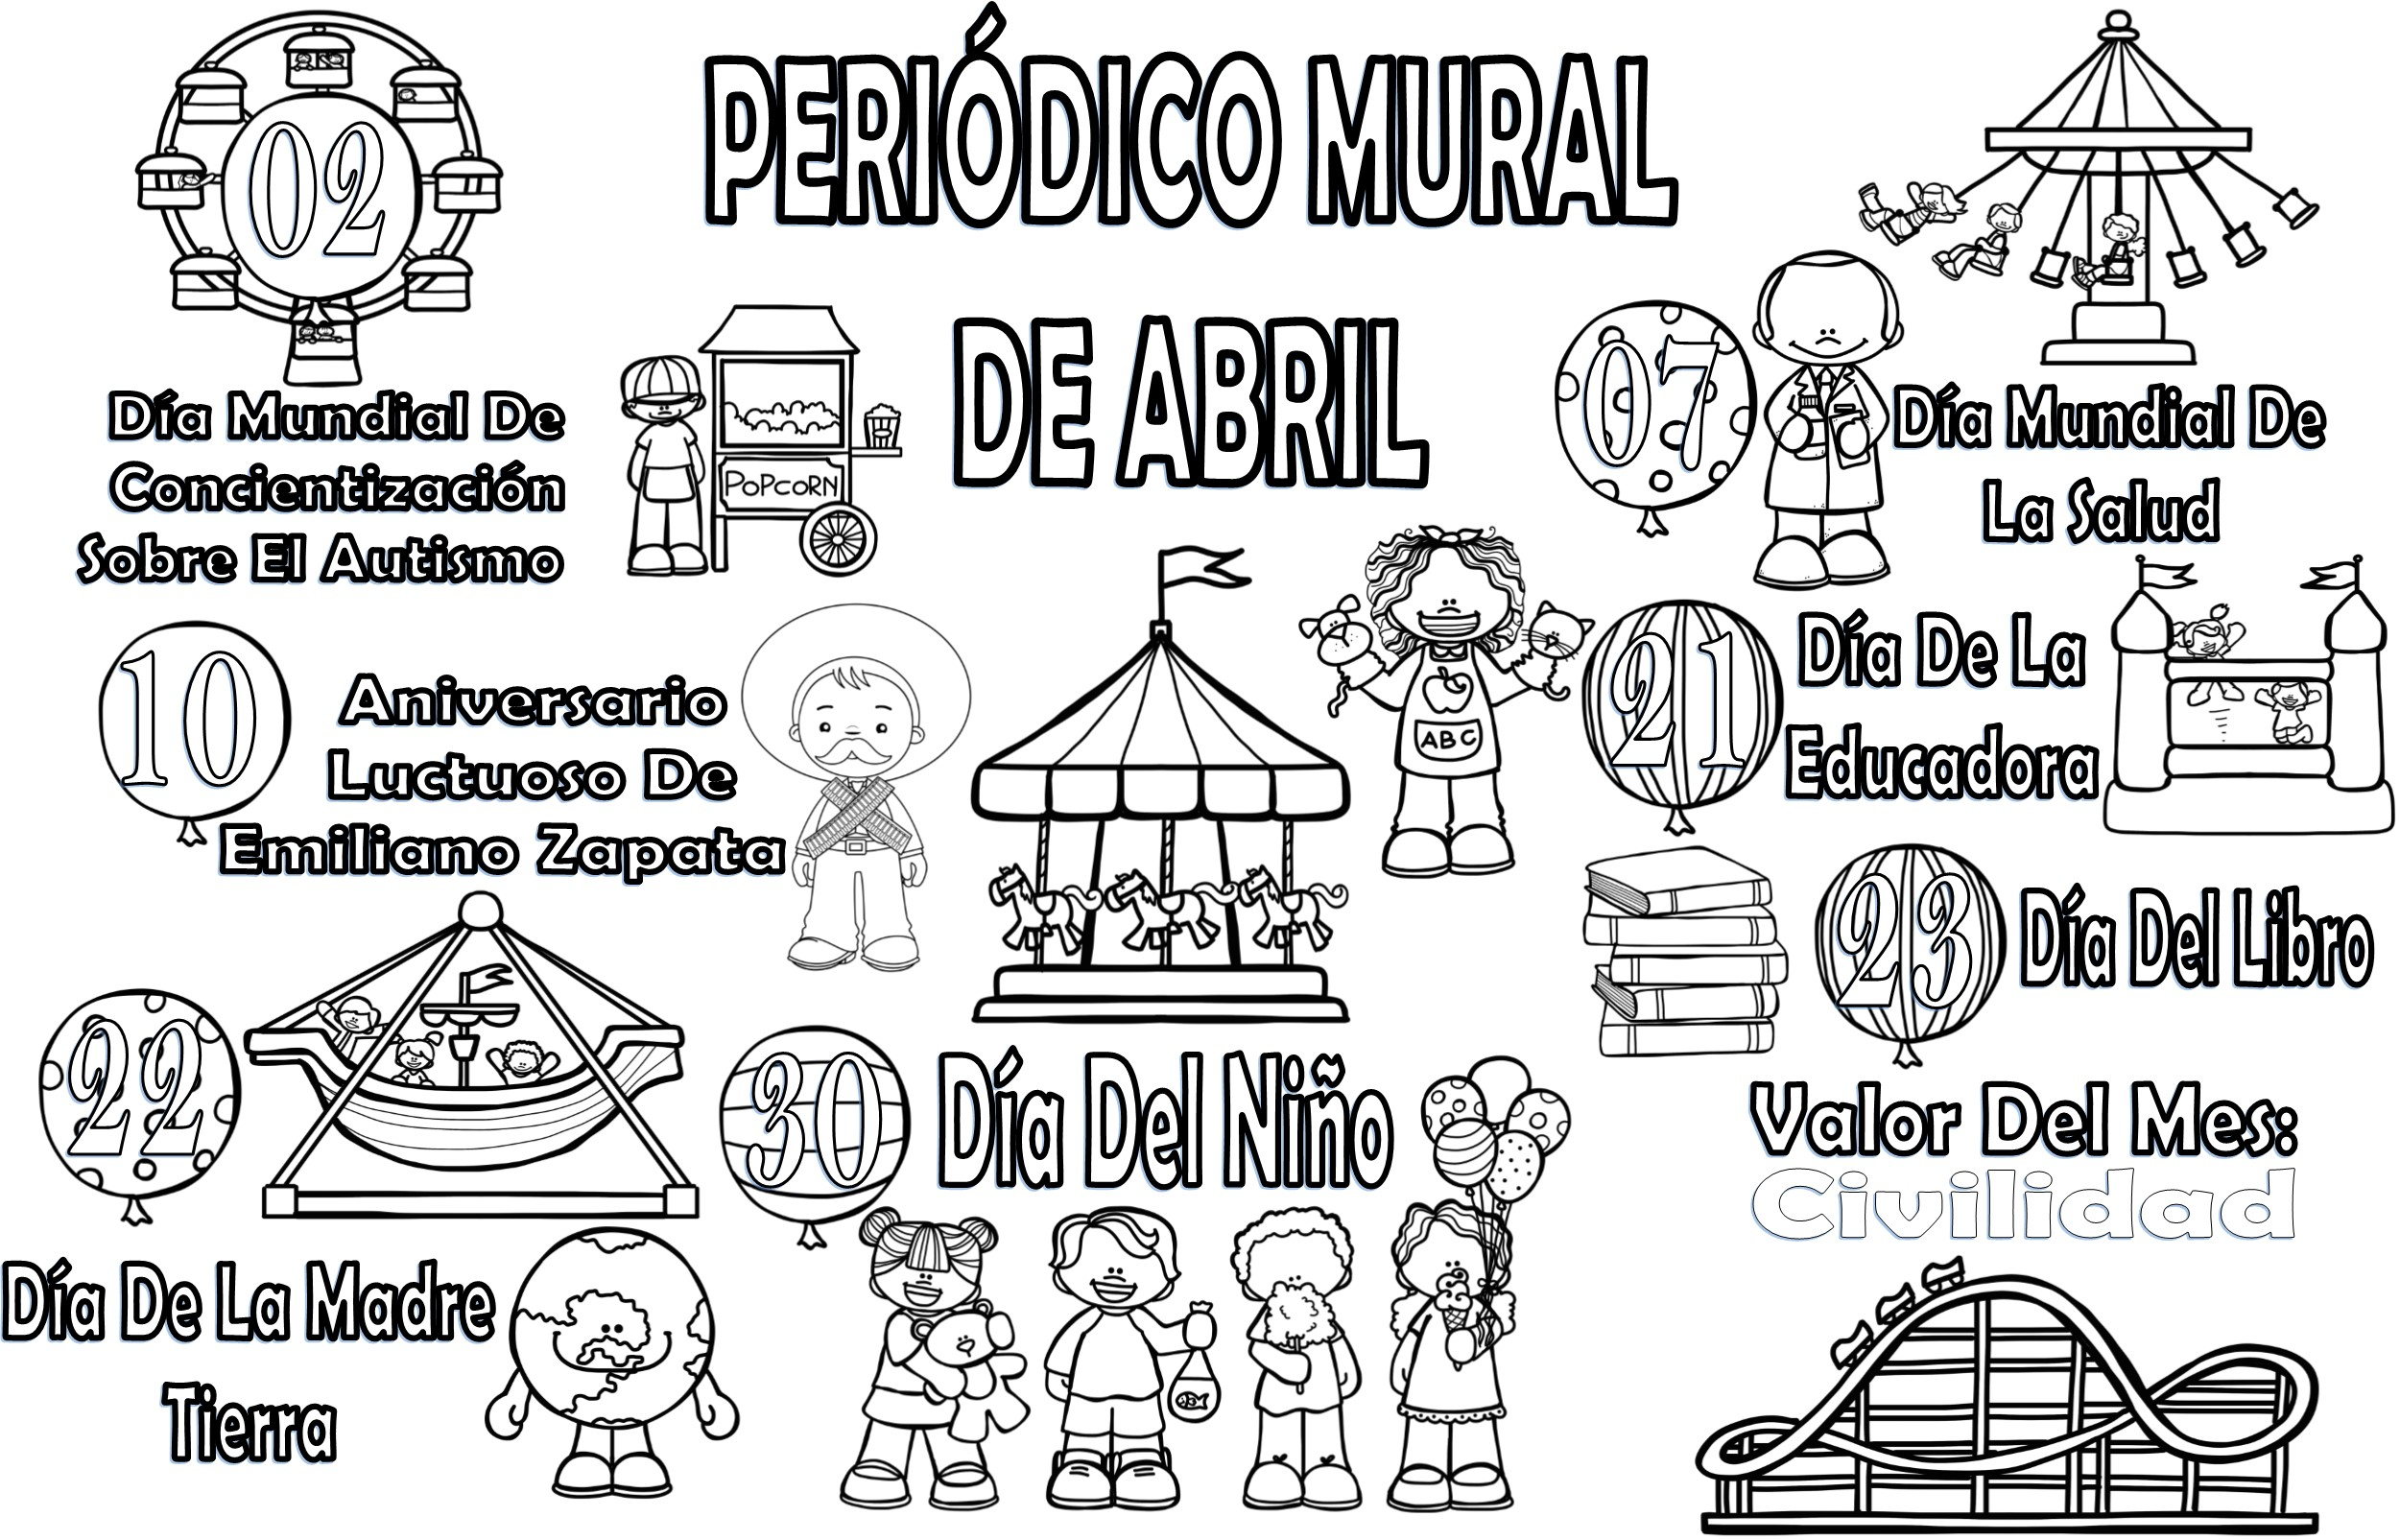 Periodico Mural De Abril Para Secundaria